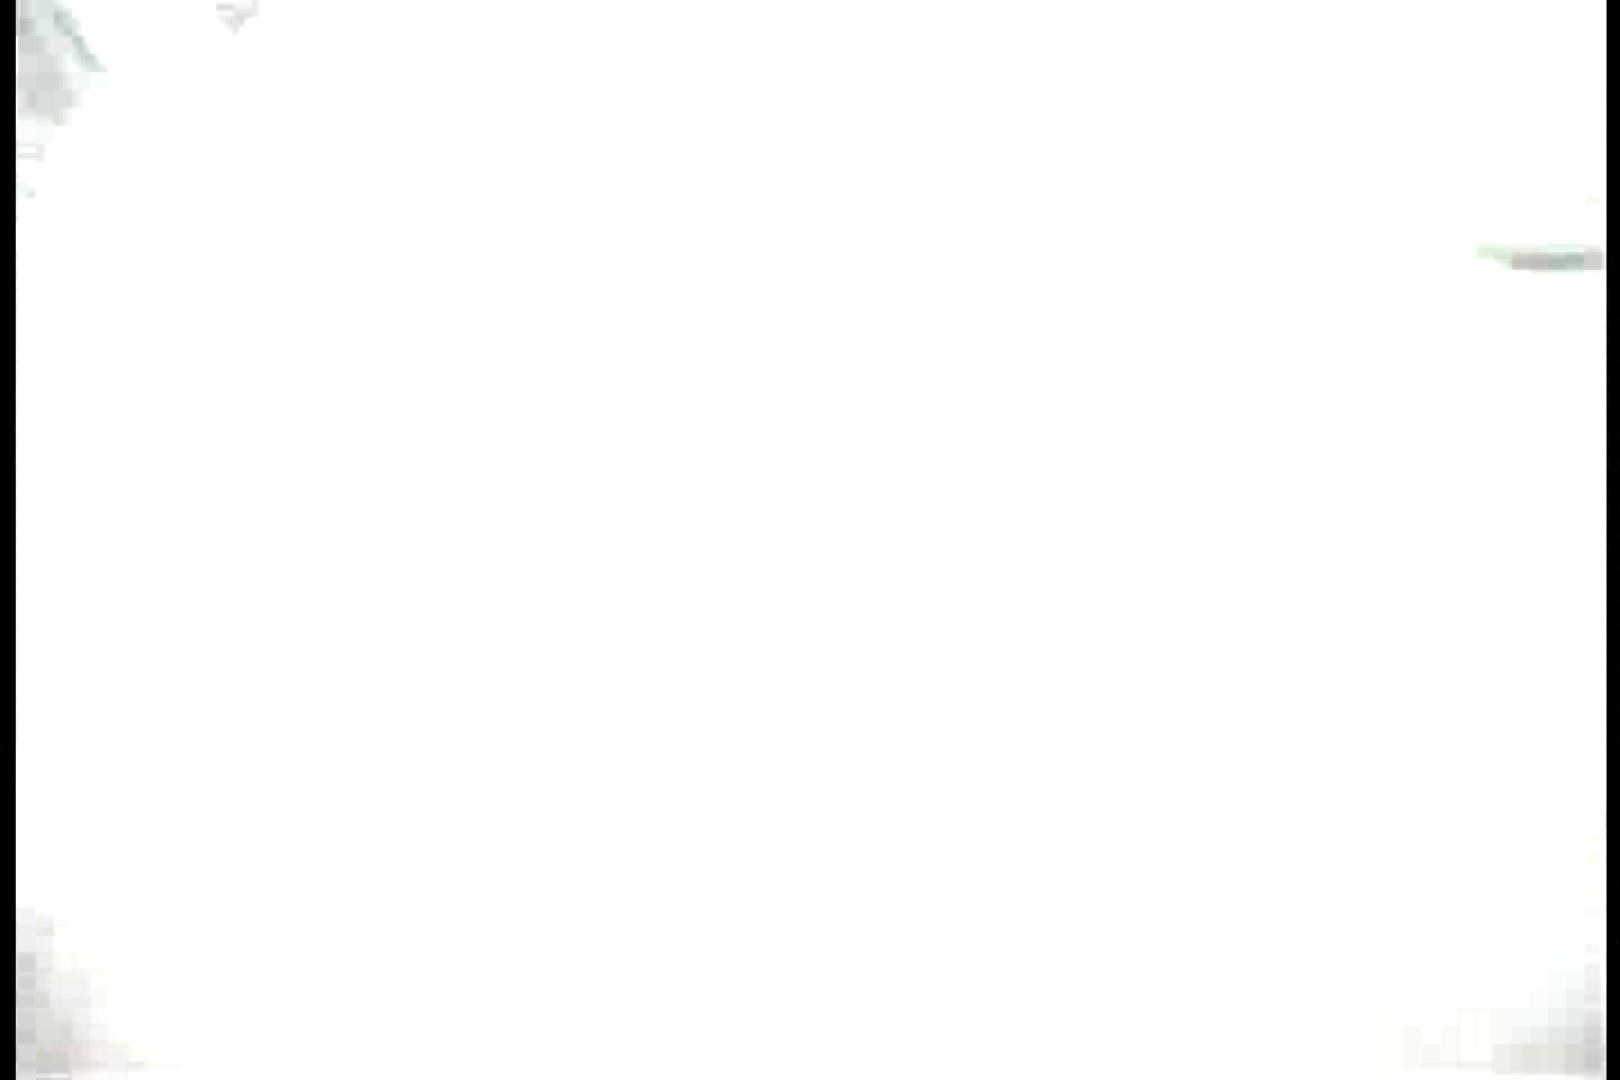 RQカメラ地獄Vol.3 レースクイーン編 ワレメ動画紹介 79画像 53